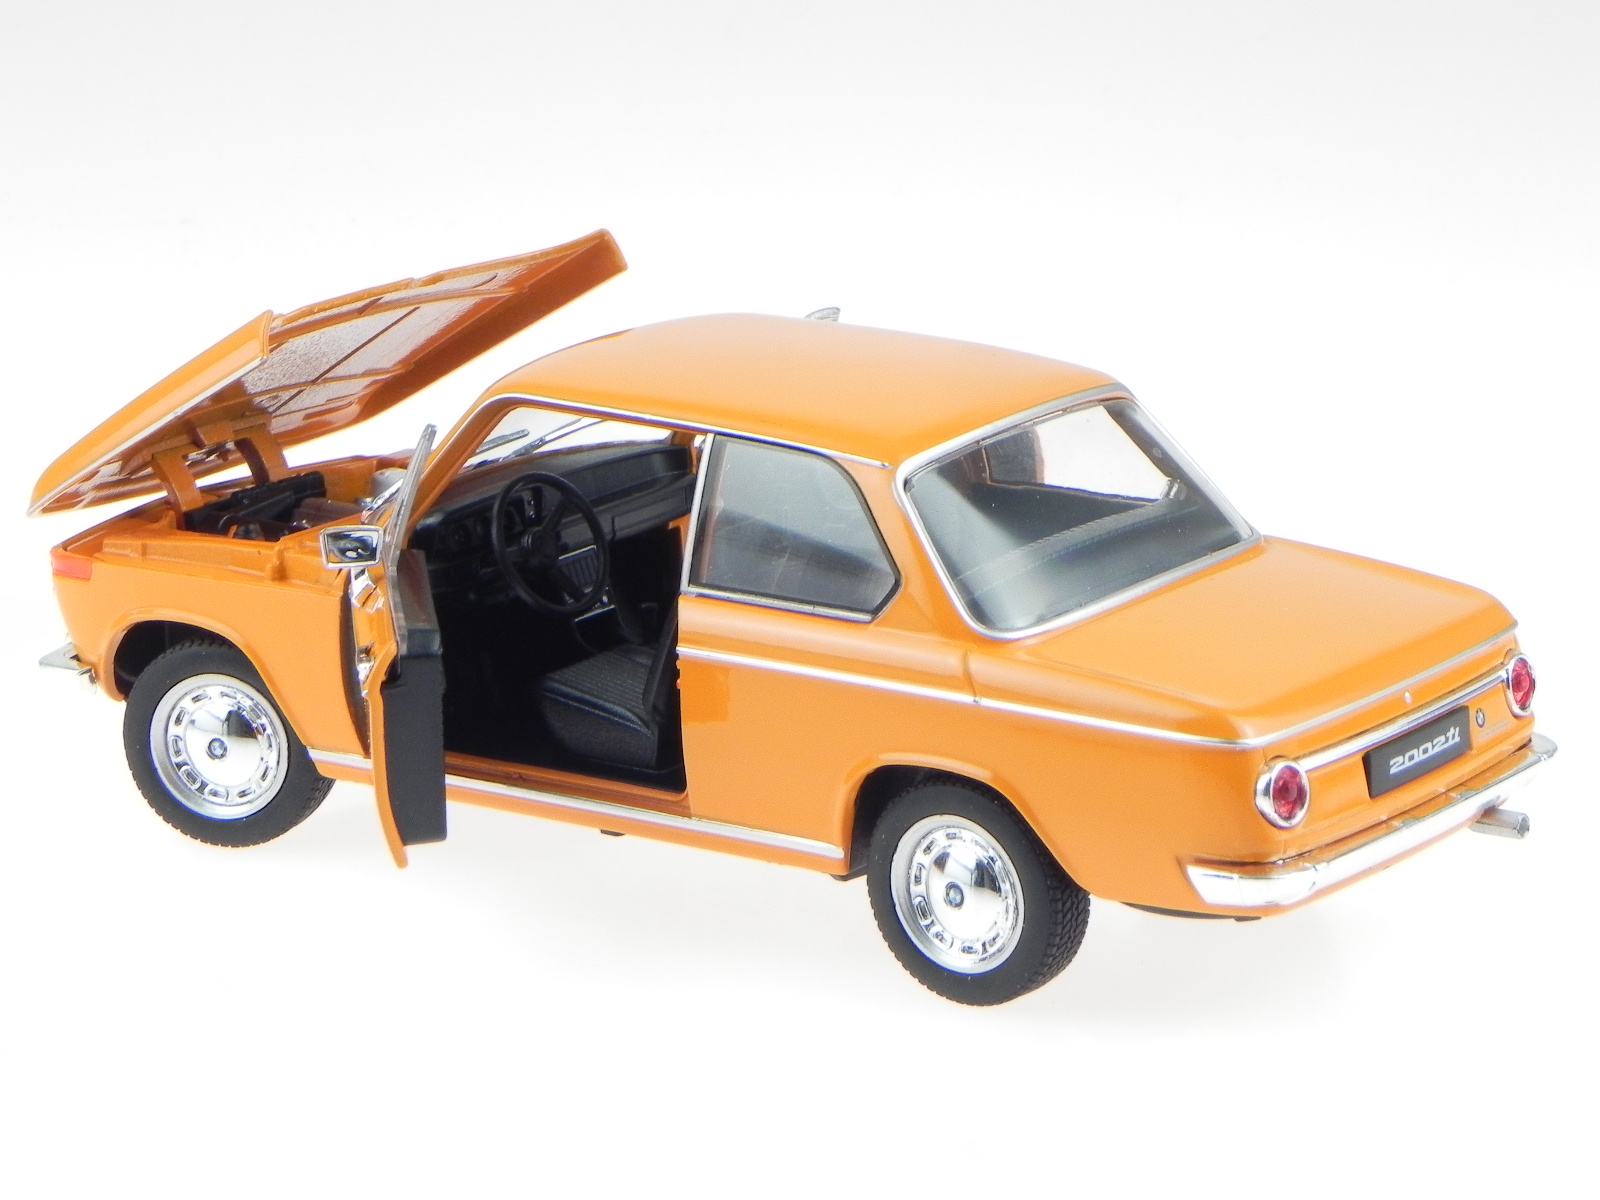 bmw e10 2002 ti orange v hicule miniature 24053 welly 1 24 eur 21 99 picclick fr. Black Bedroom Furniture Sets. Home Design Ideas